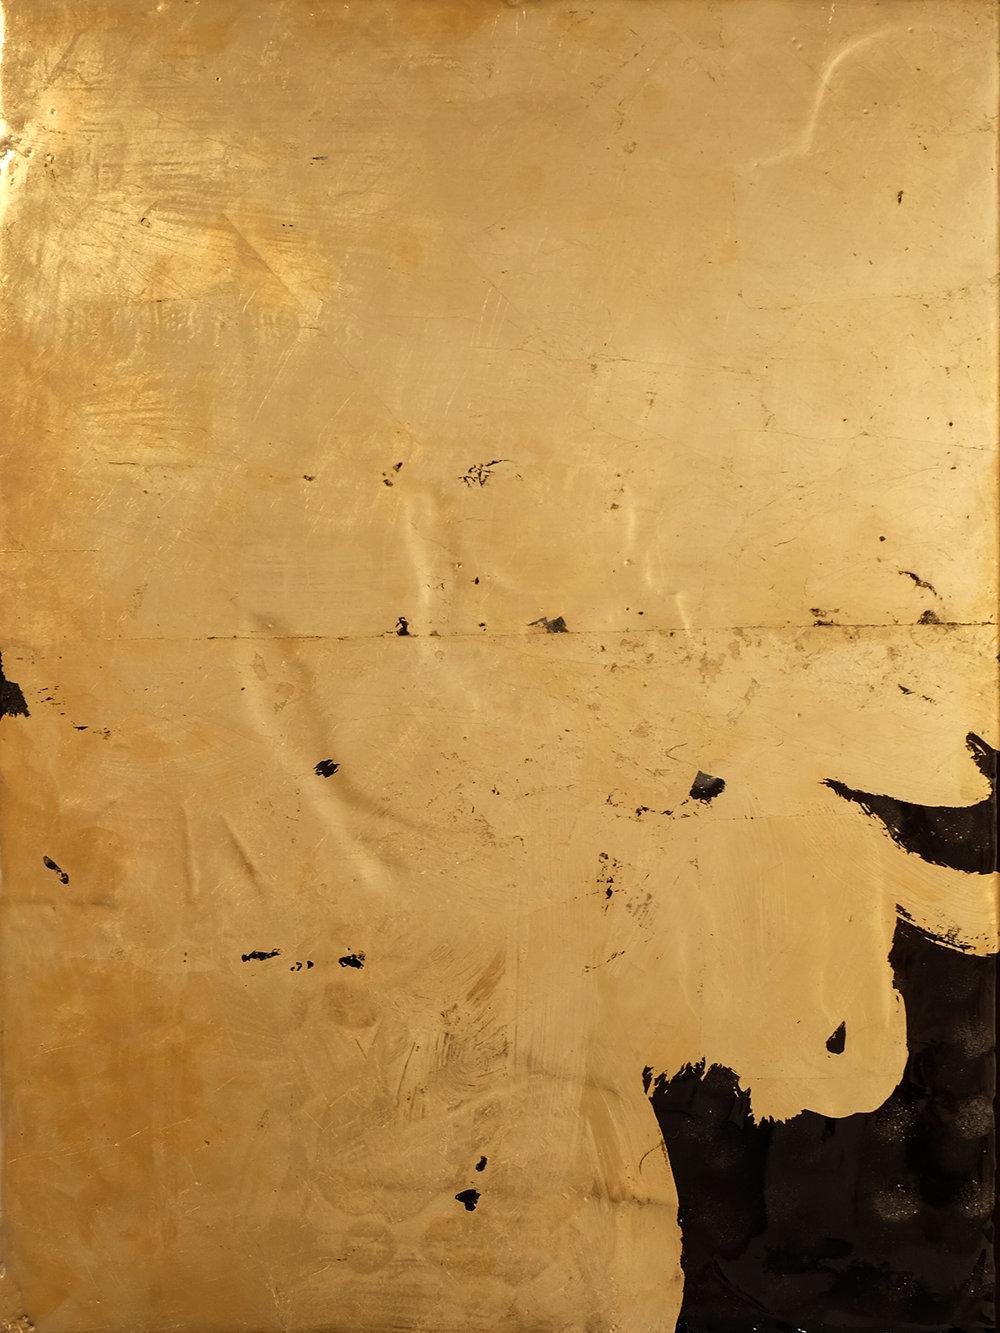 shirin-shafiee---Untitled-(gold-piece)_REQUIRED_AYDIN-HAMAMI.jpg